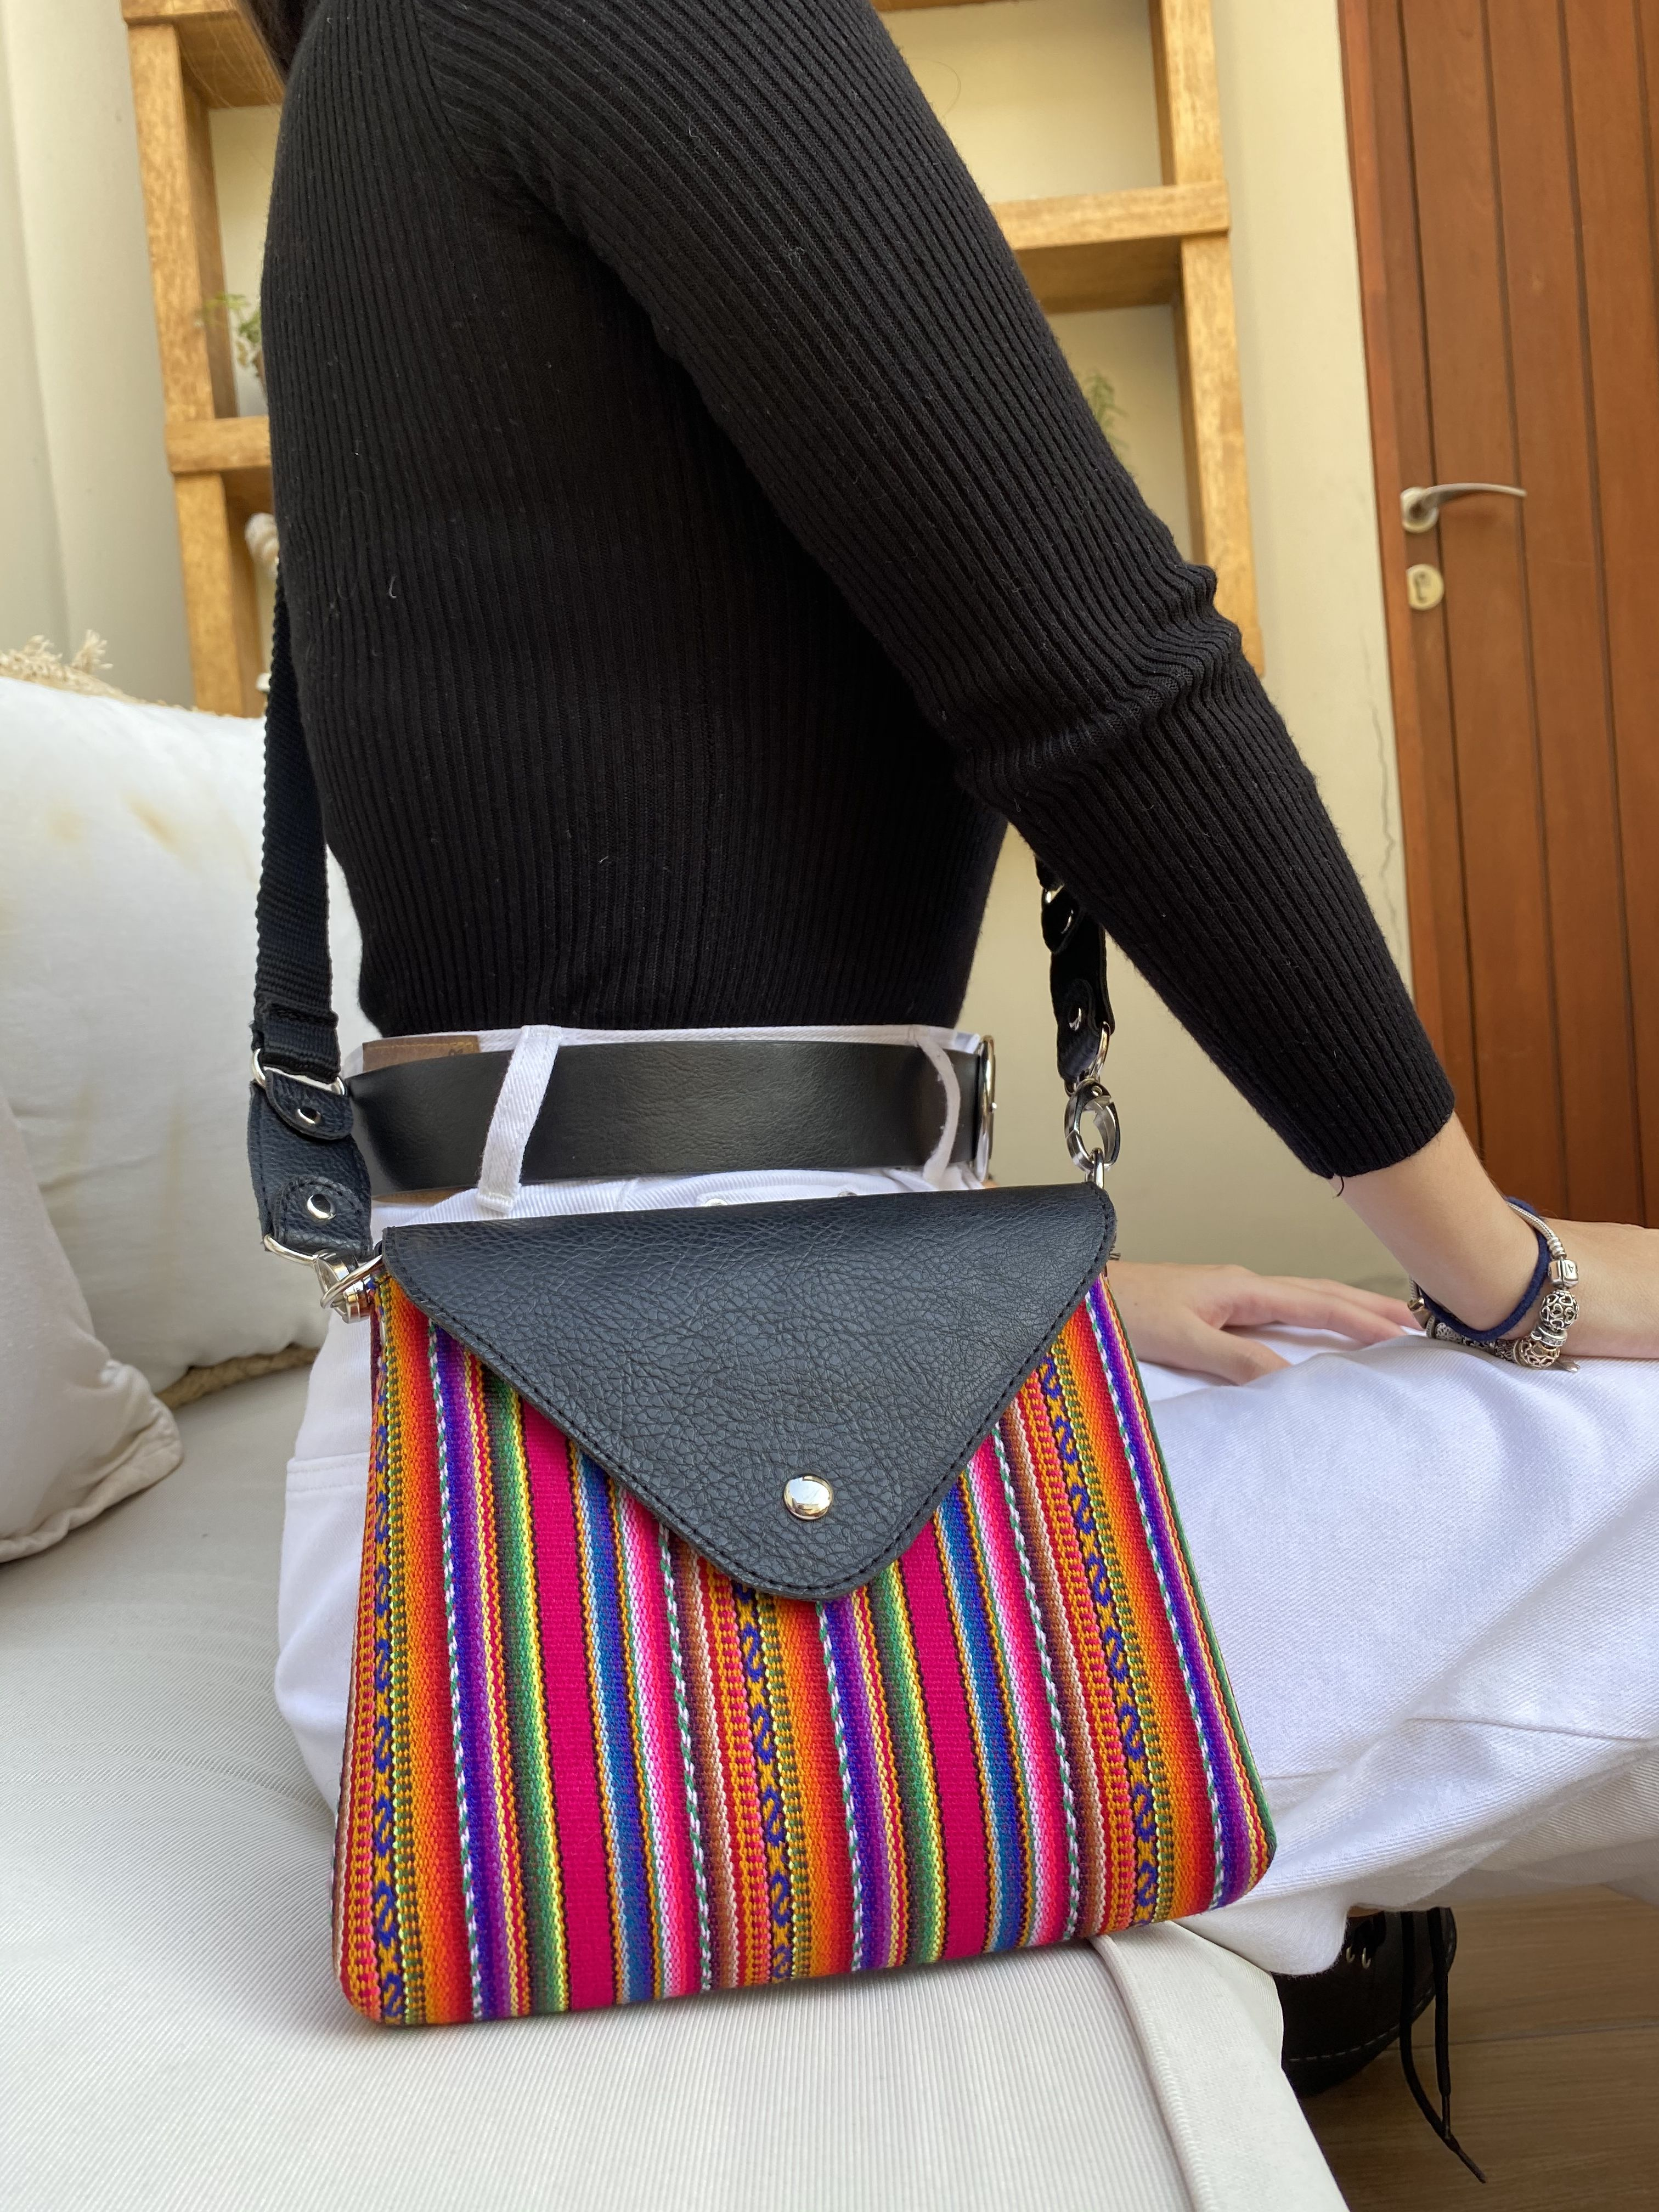 A unique crossbody bag with peruvian essence ✨ #handmade #color #lookoftheday